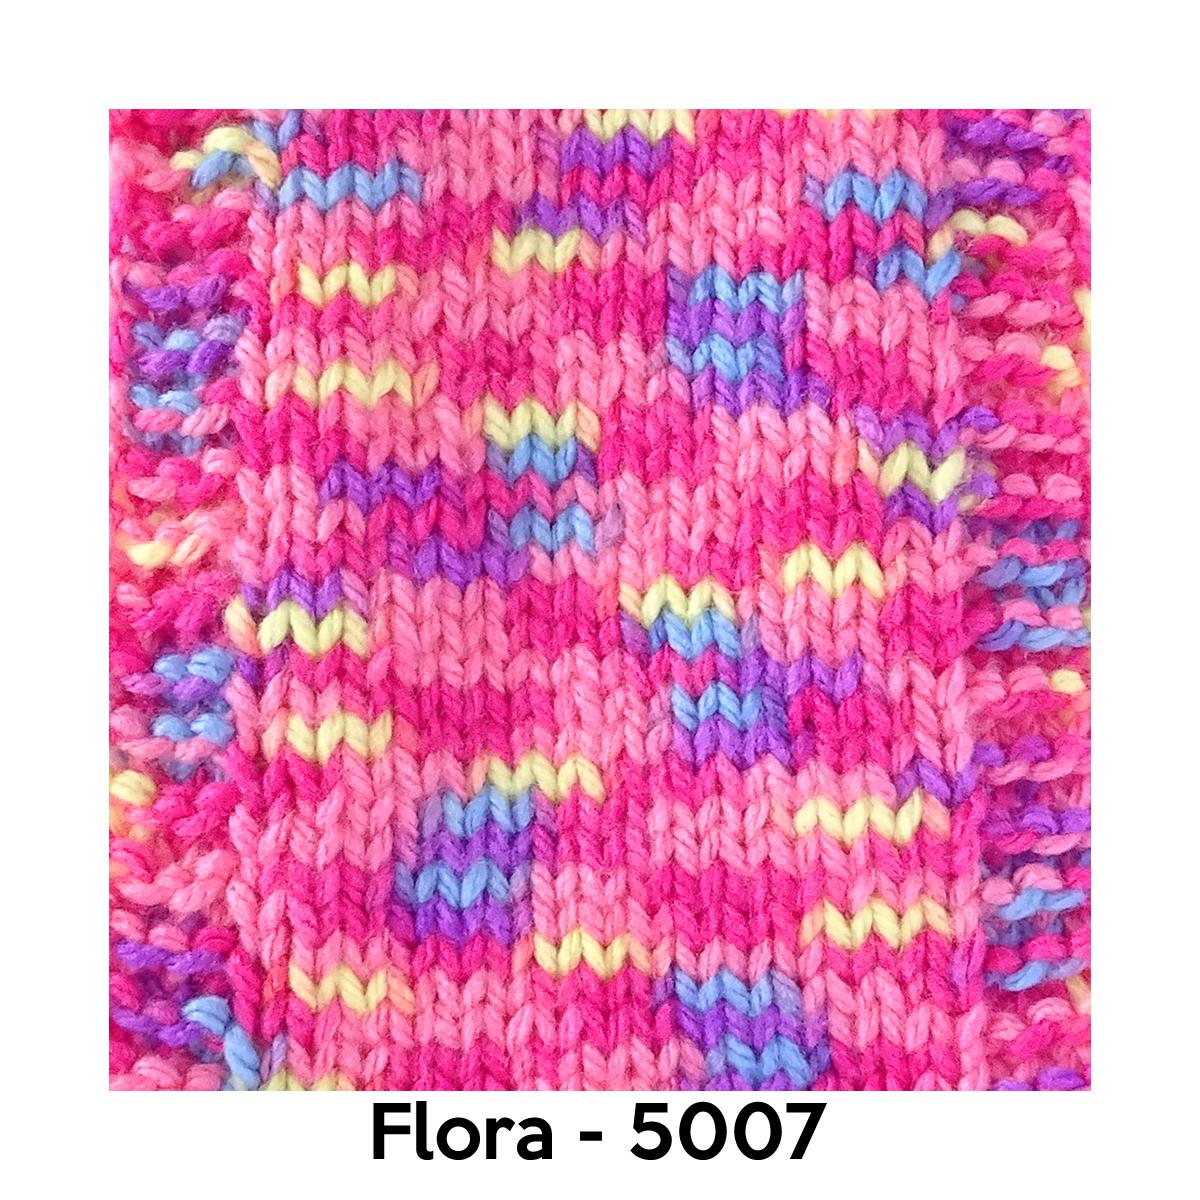 Flora - 5007